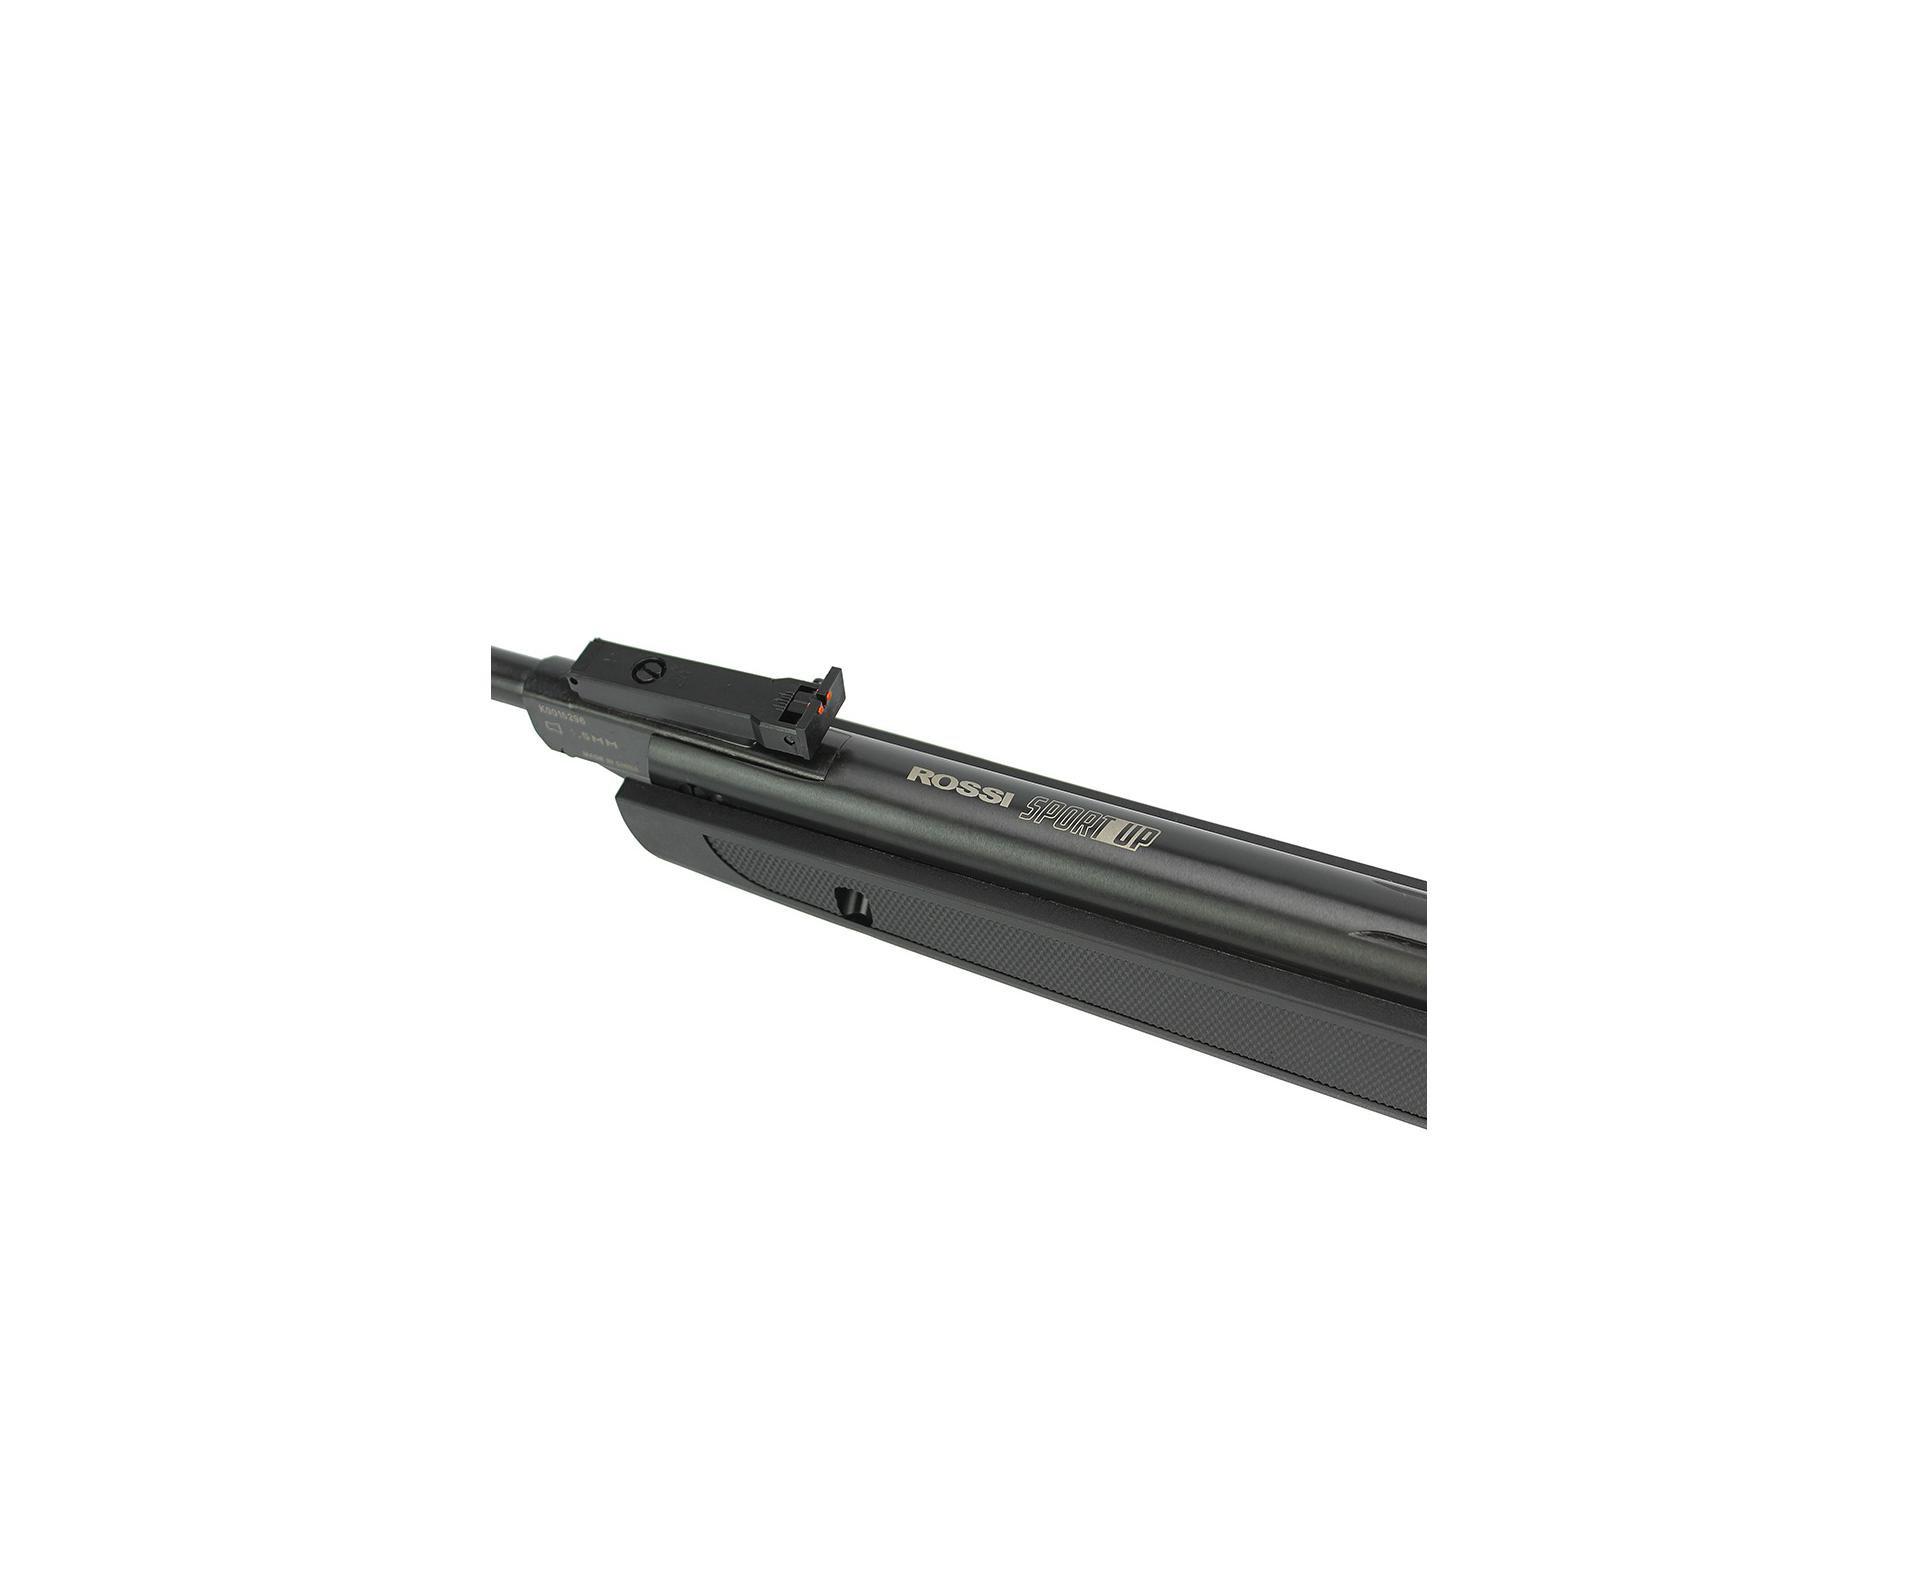 Carabina De Pressão Rossi Dione Sport Up Power 5,5mm